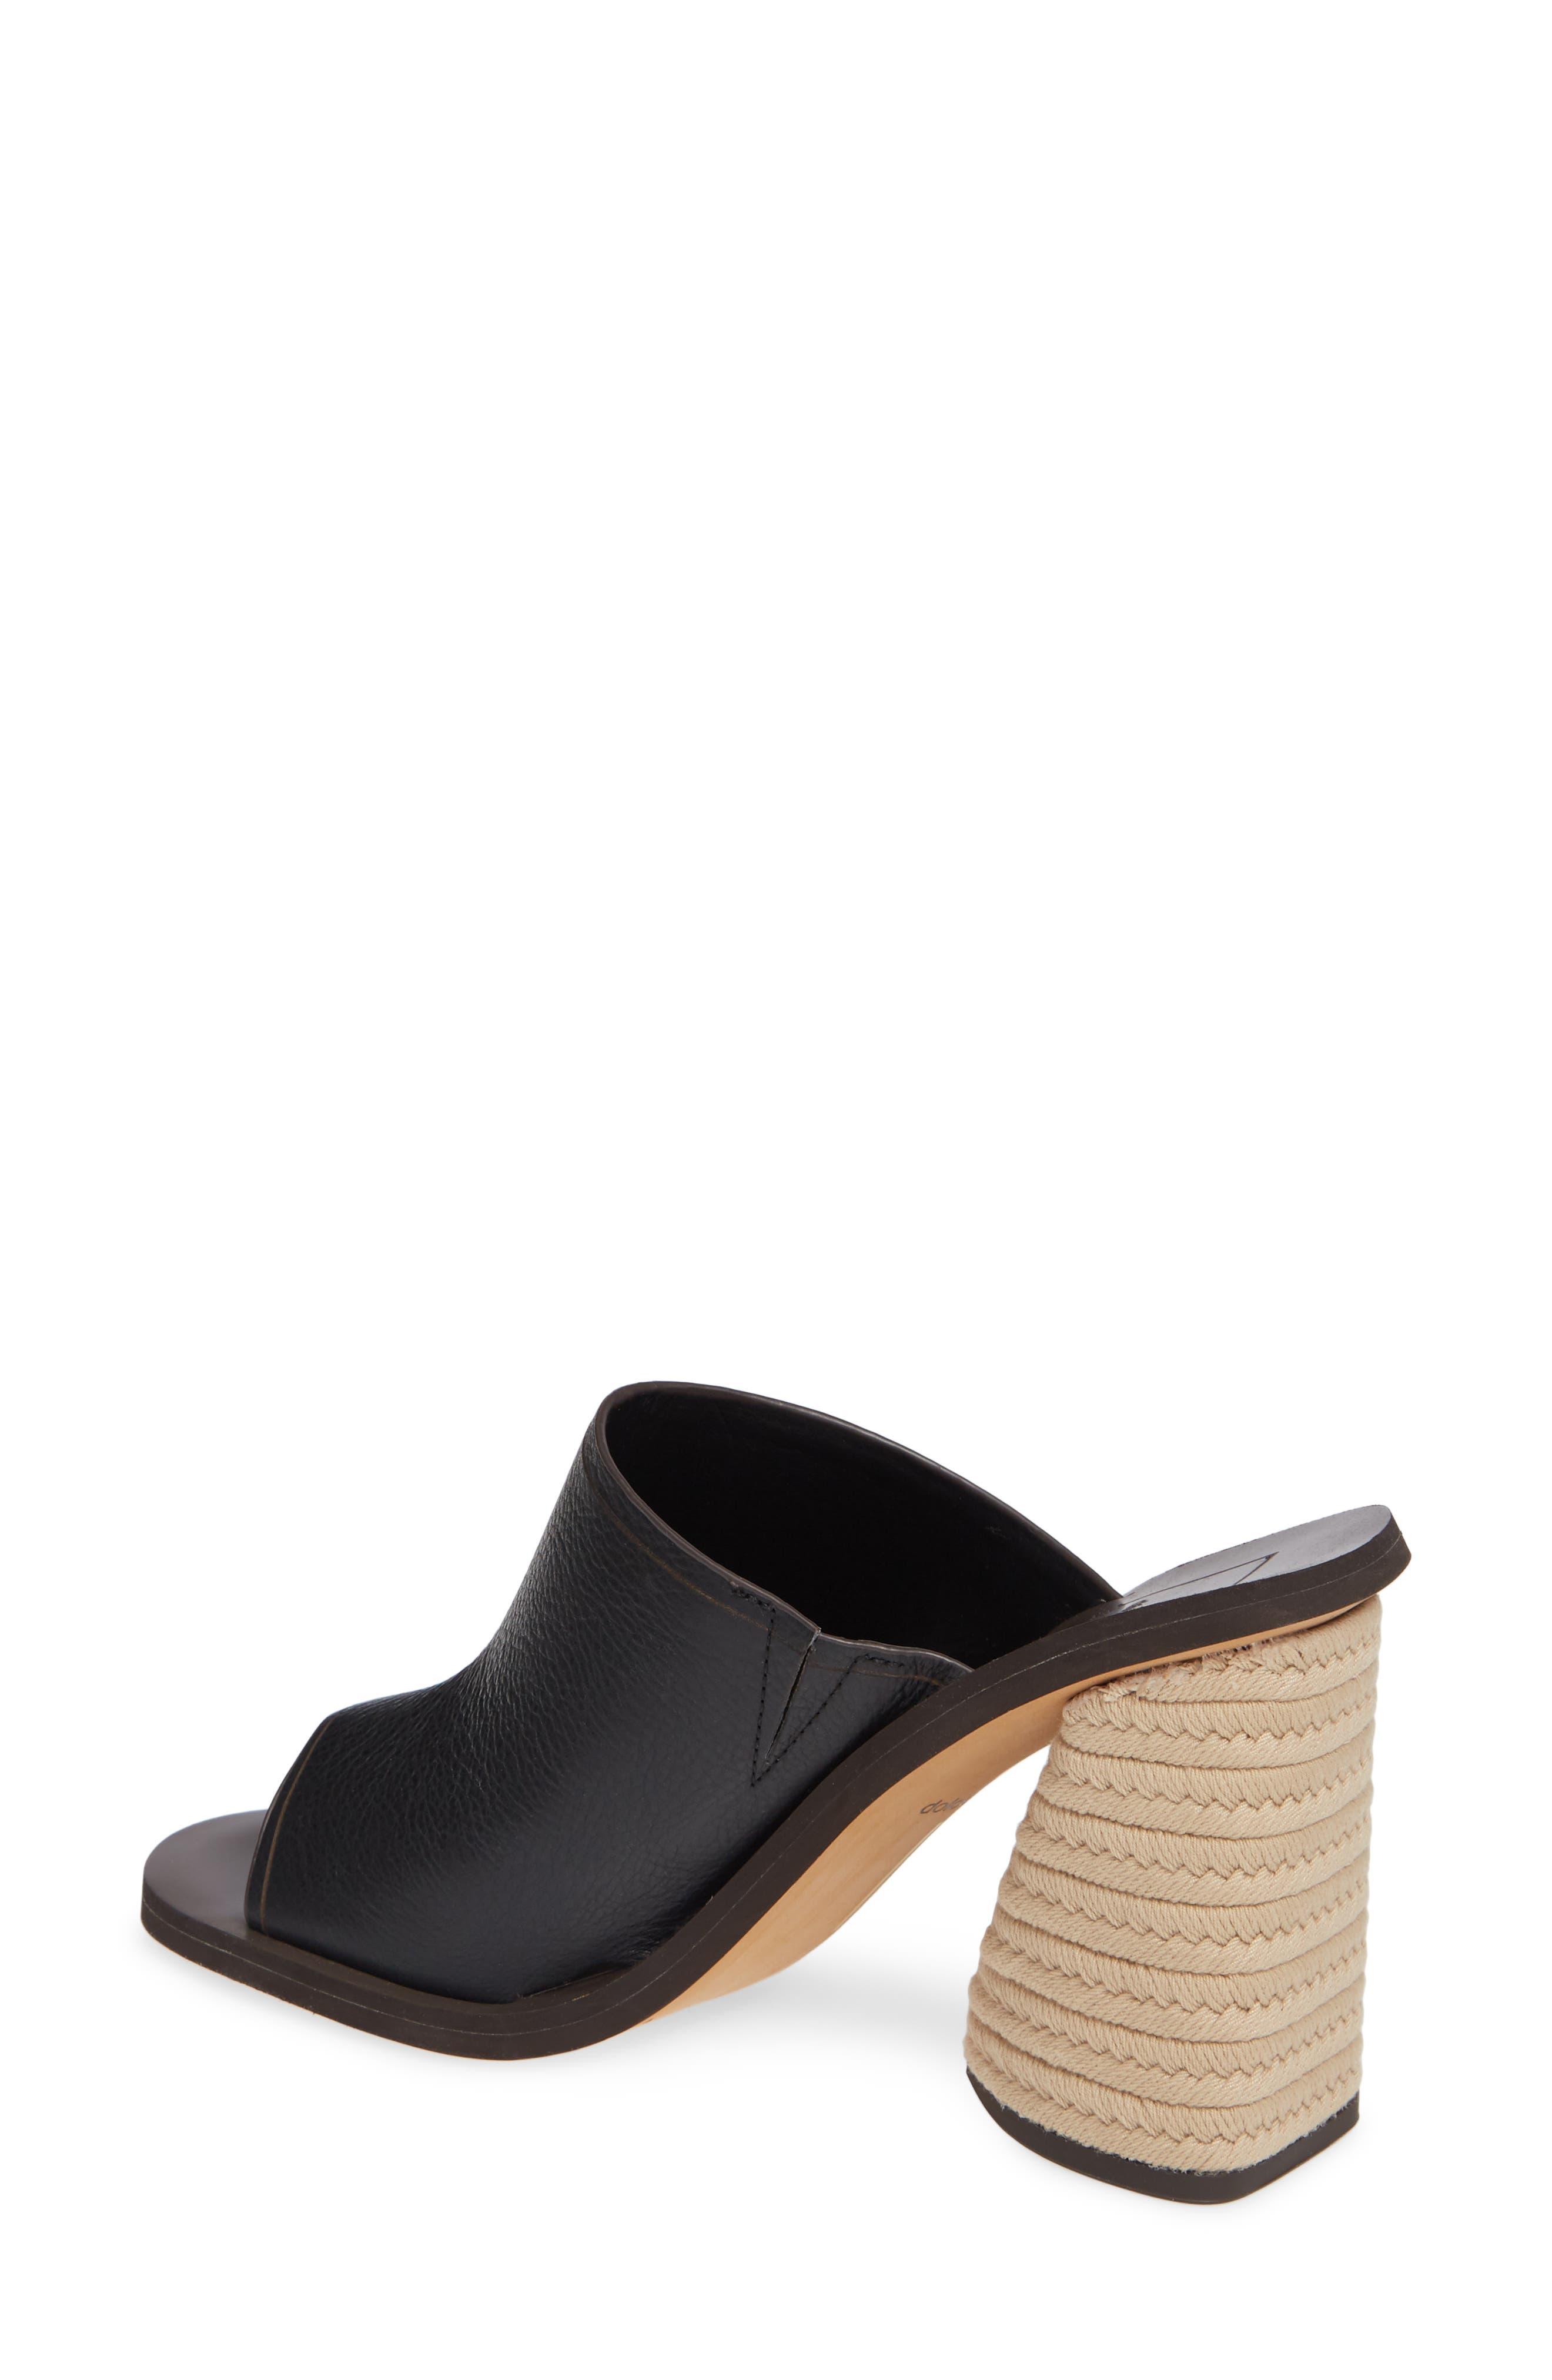 DOLCE VITA, Alba Braided Heel Mule Sandal, Alternate thumbnail 2, color, BLACK LEATHER